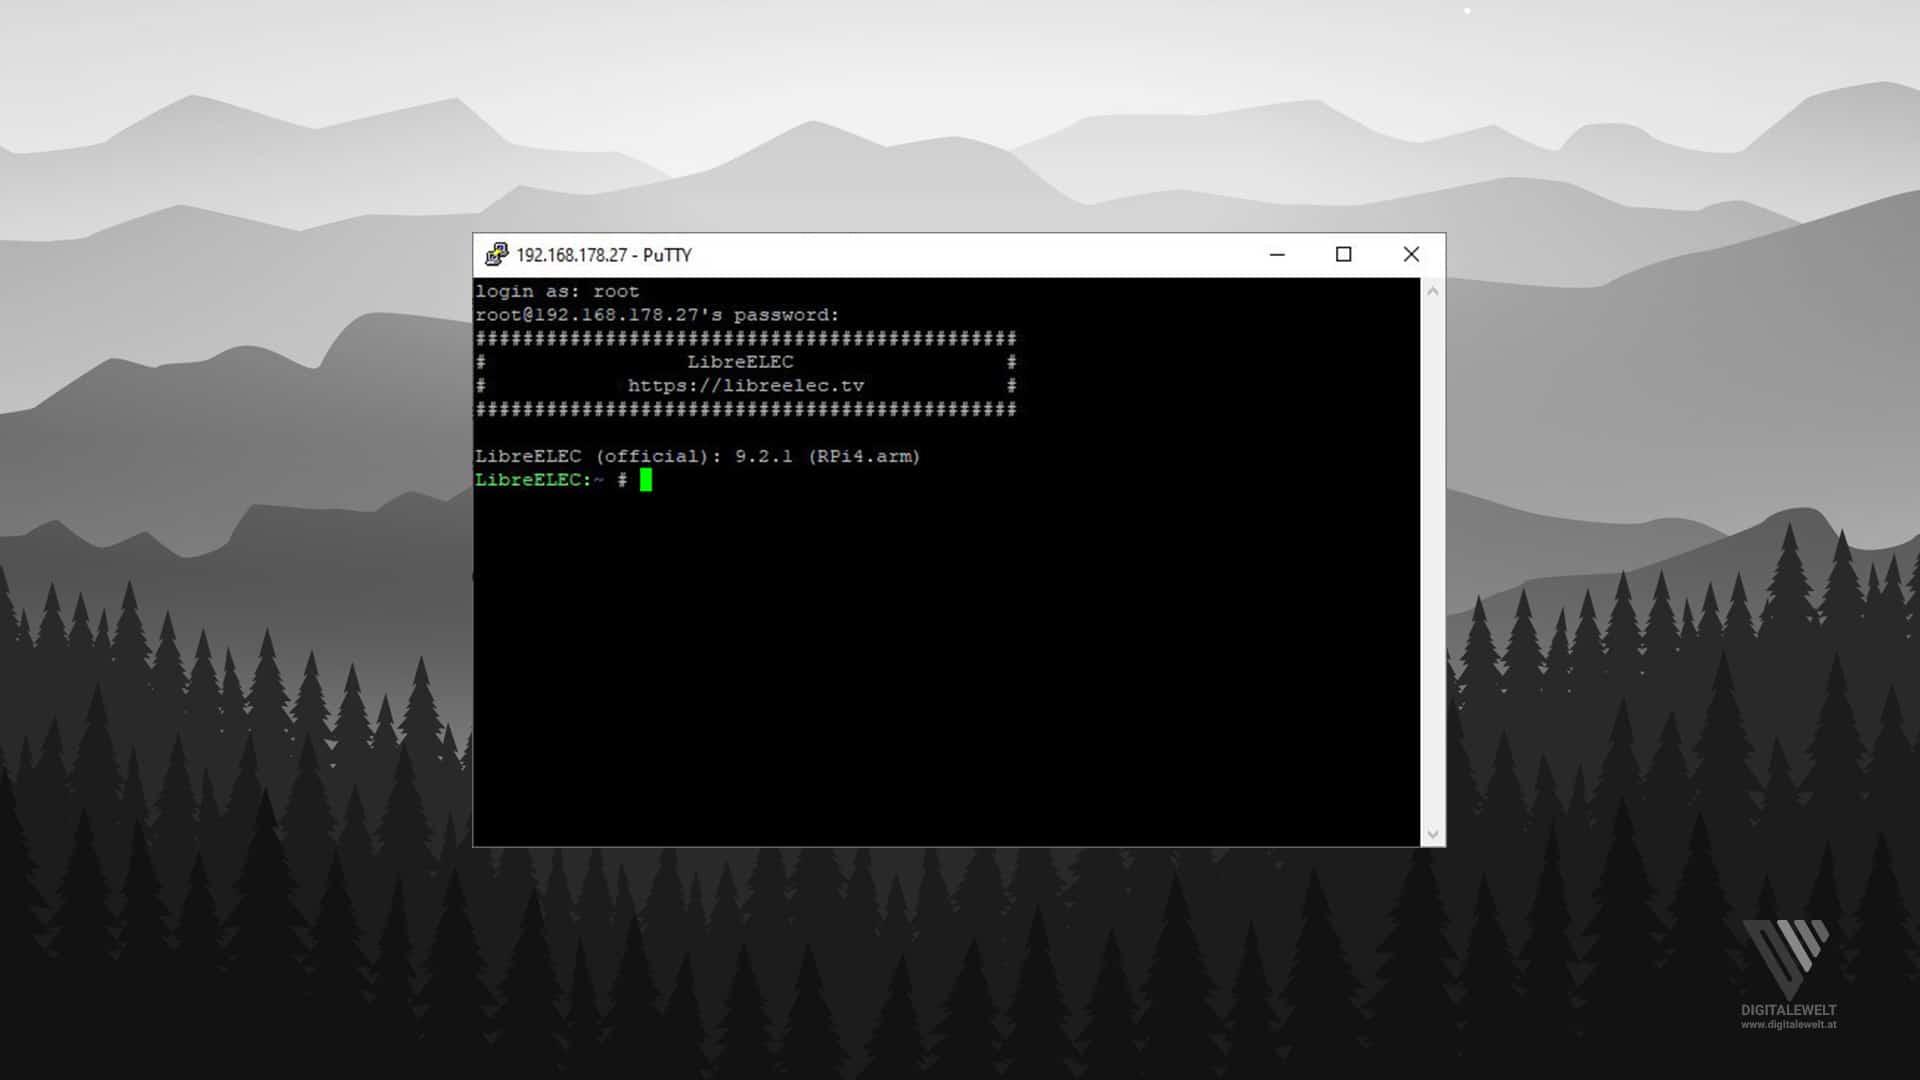 Hyperion.ng installieren - Putty Login - digitalewelt.at